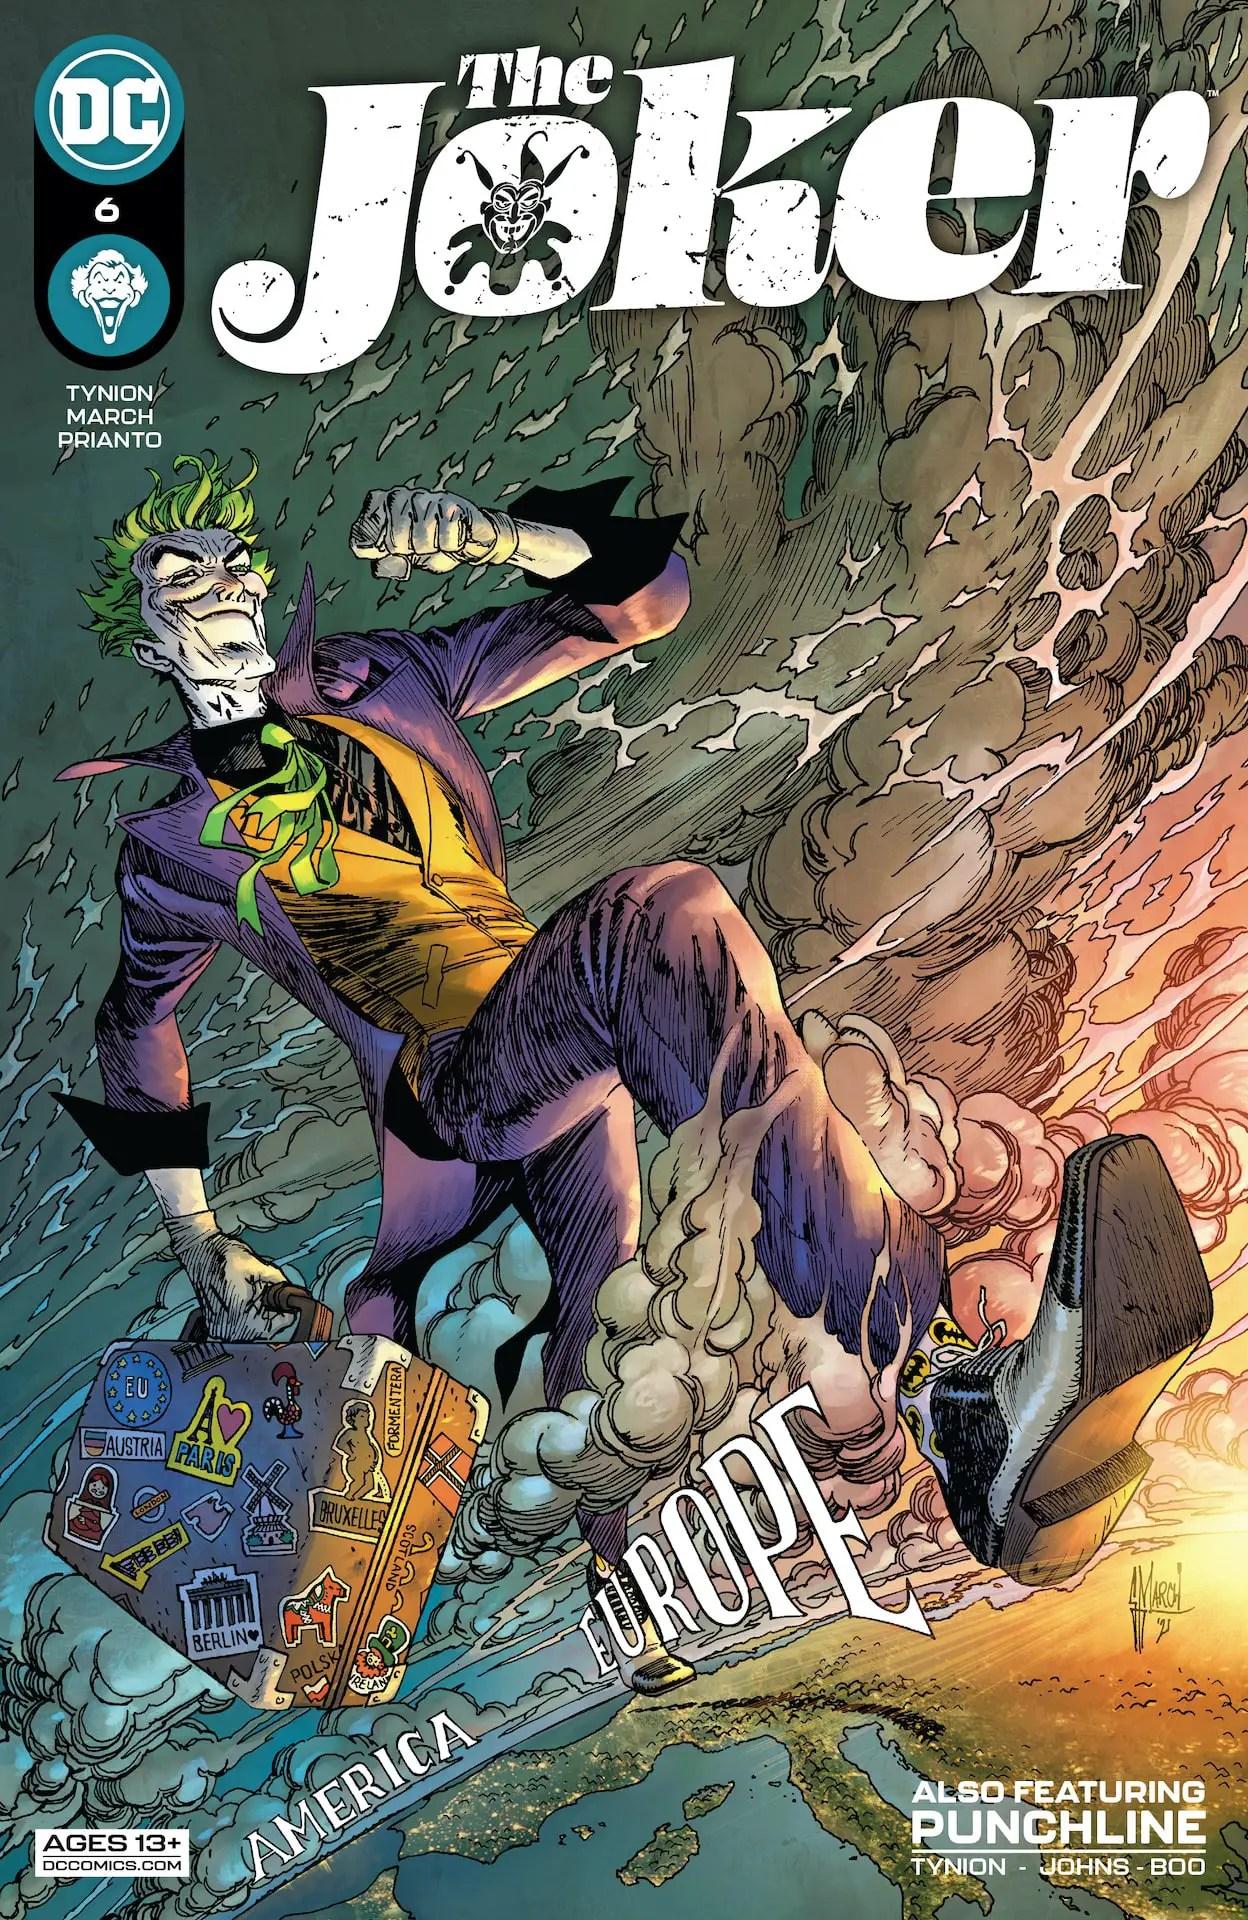 'The Joker' #6 goes to Paris